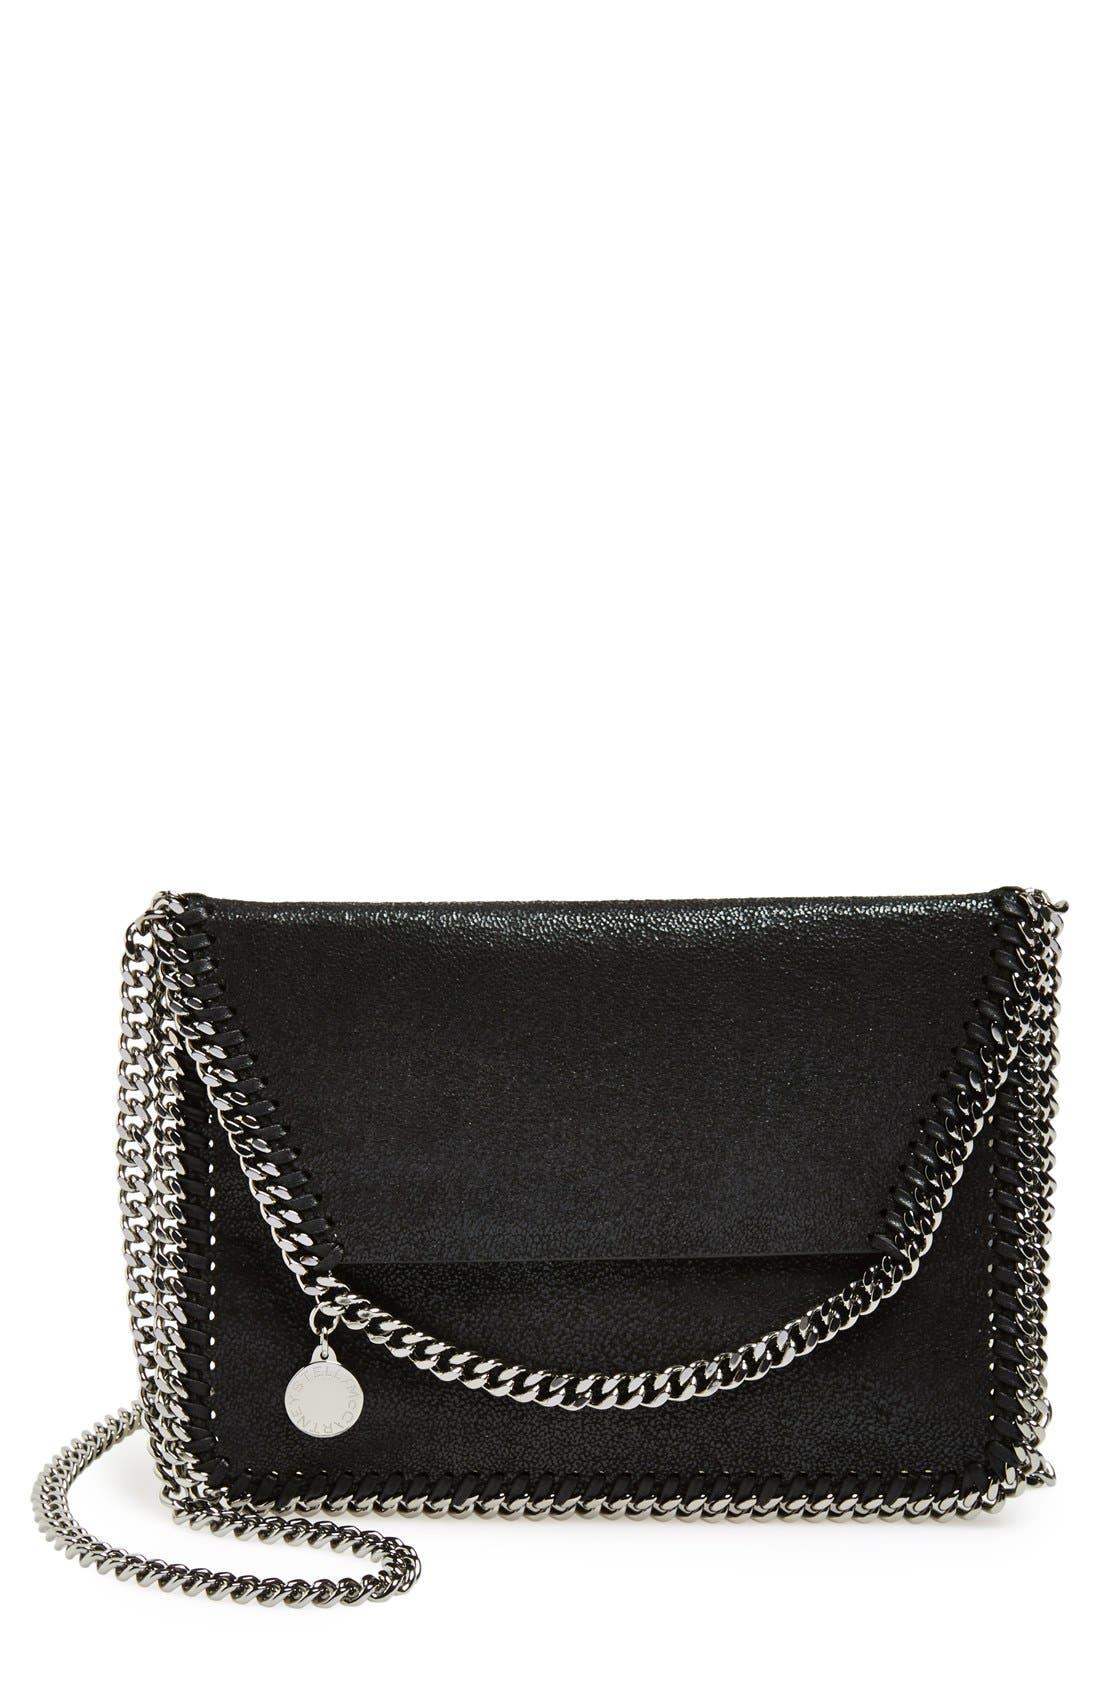 'Mini Falabella - Shaggy Deer' Faux Leather Crossbody Bag,                         Main,                         color, 001